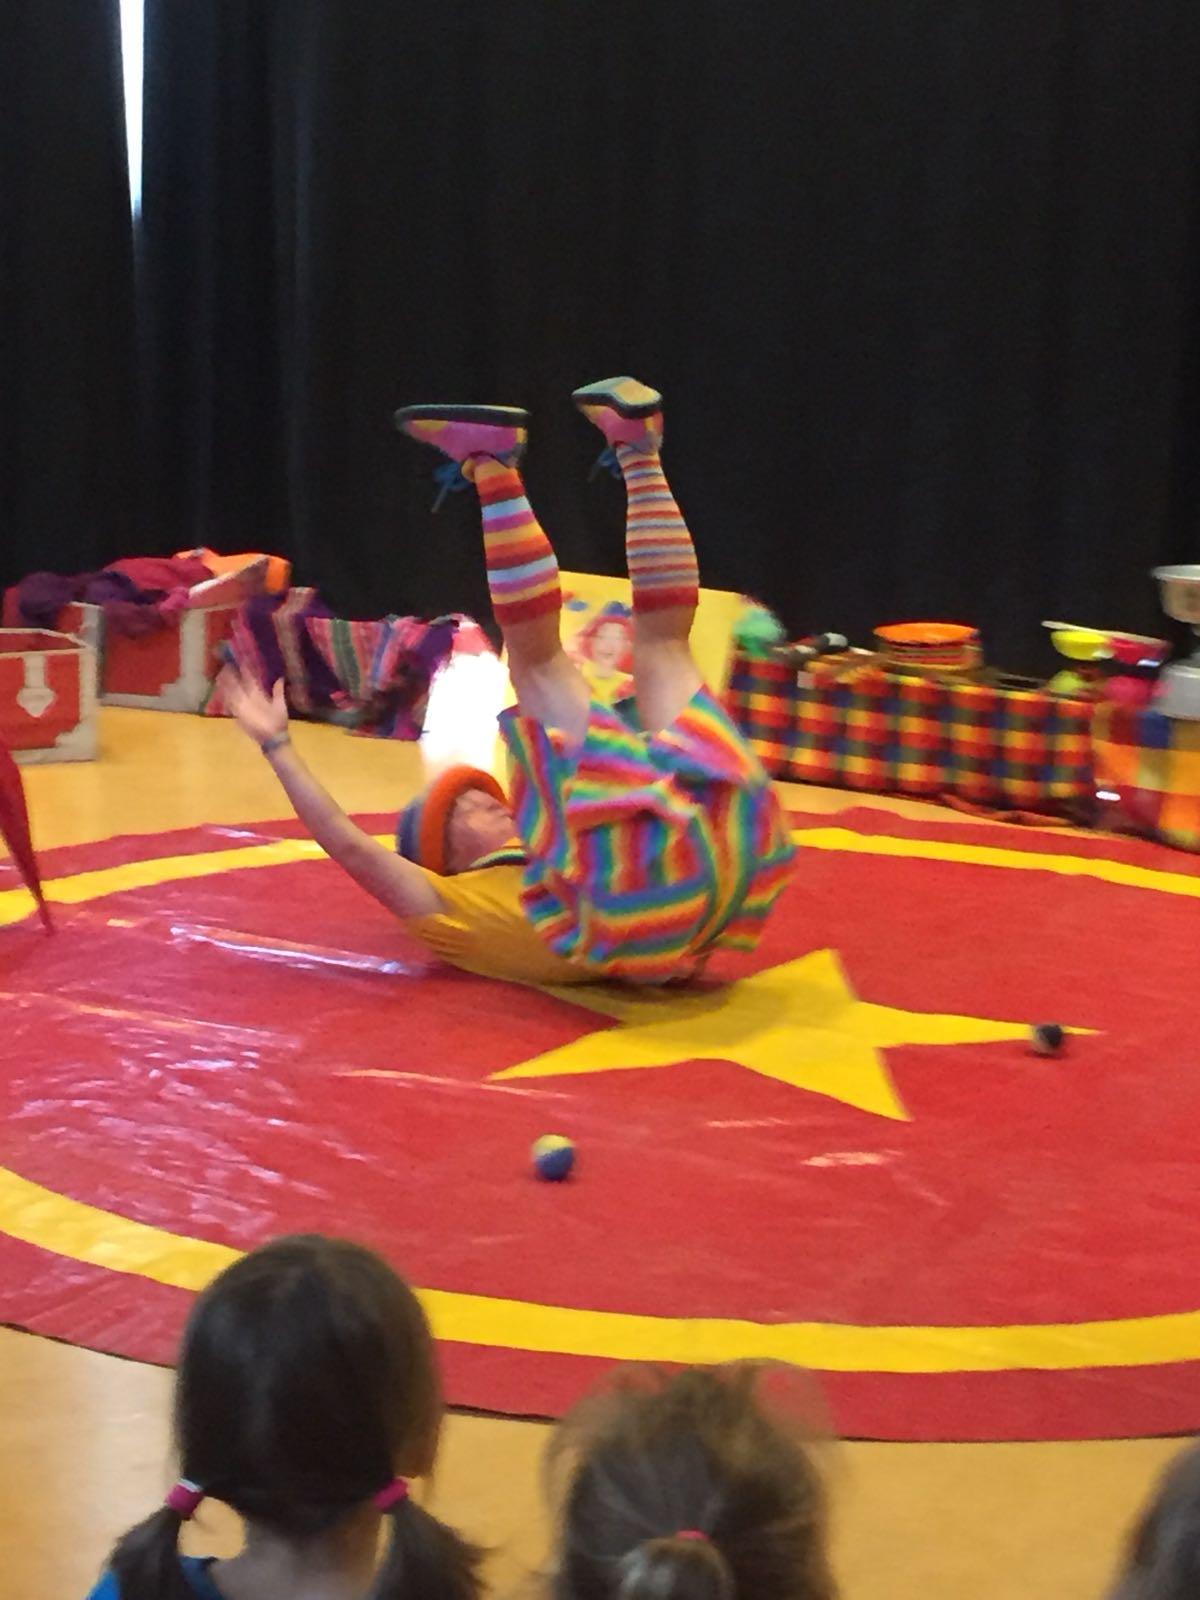 Clown Kiko BSO Kion zomertour voorstelling OEPS upside down